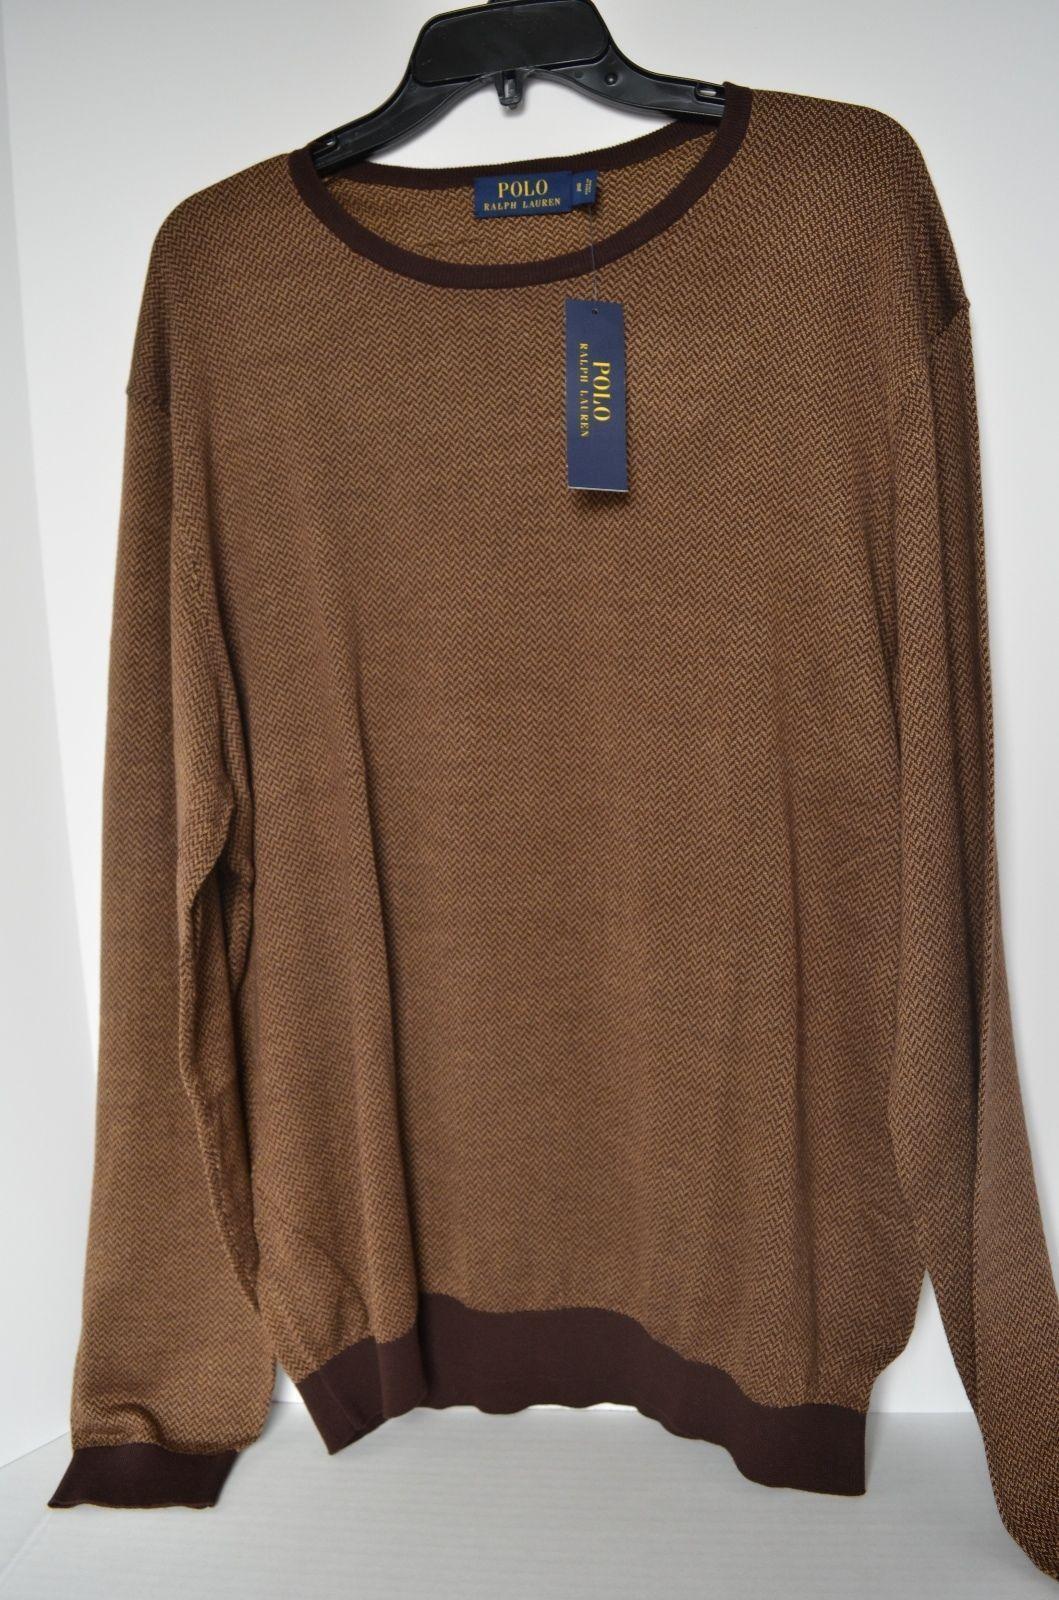 $198.00  Polo Ralph Lauren Silk Cotton Crewneck Sweater  Size L